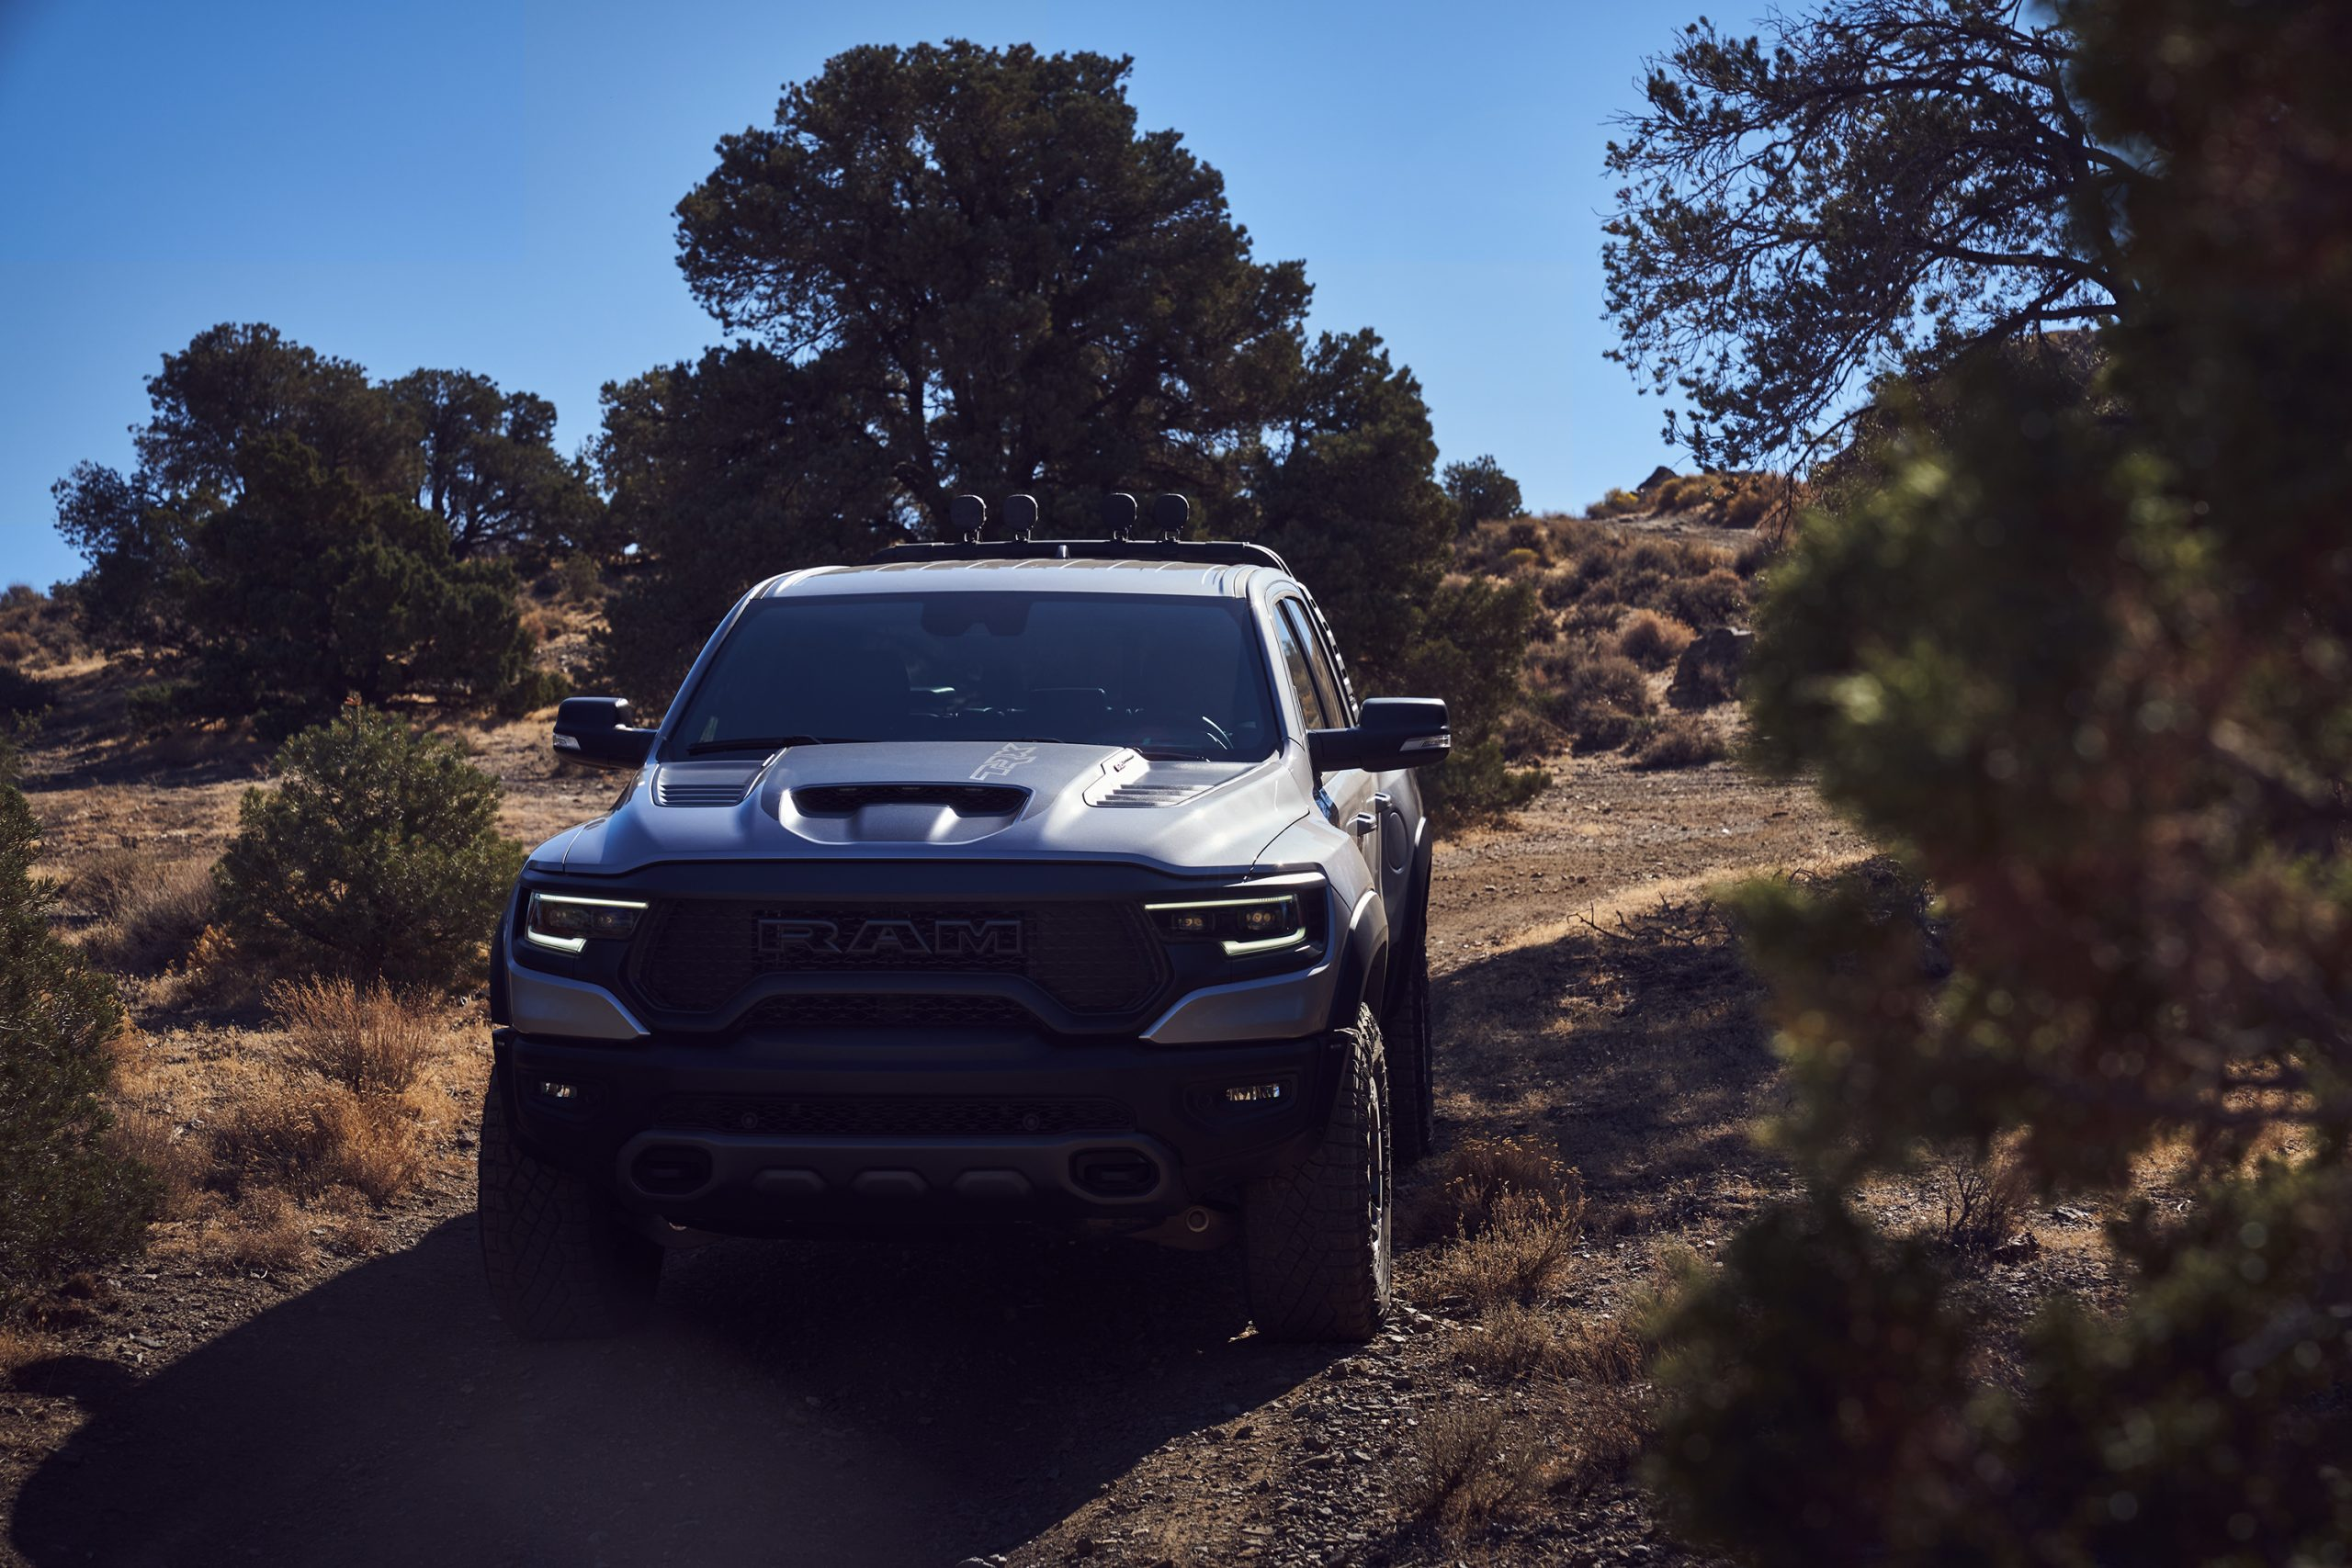 2021 Ram 1500 TRX front trail